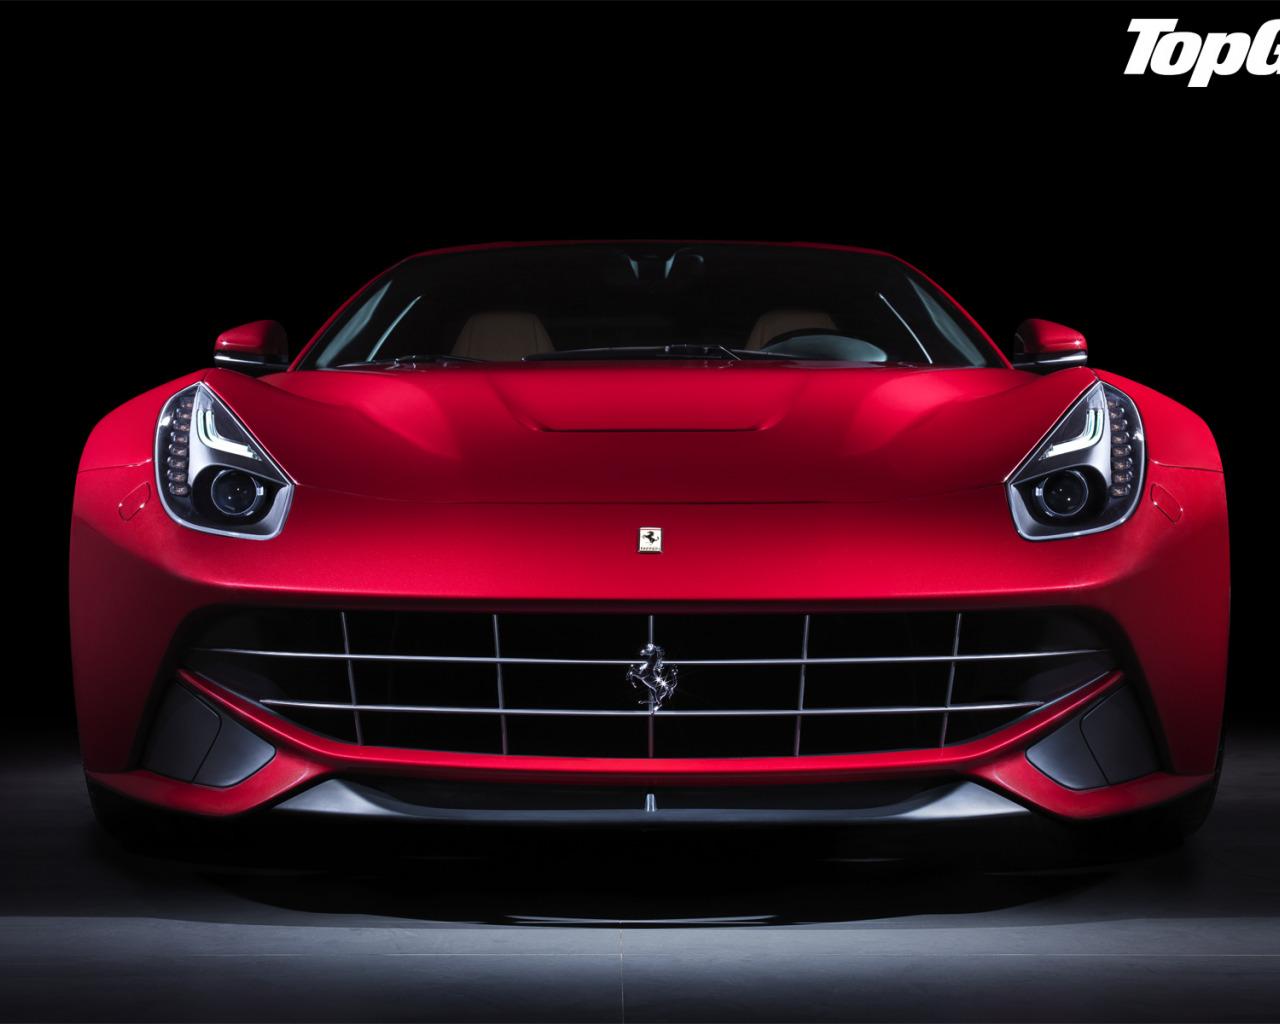 Ferrari F12 дорога забор  № 2437993 бесплатно